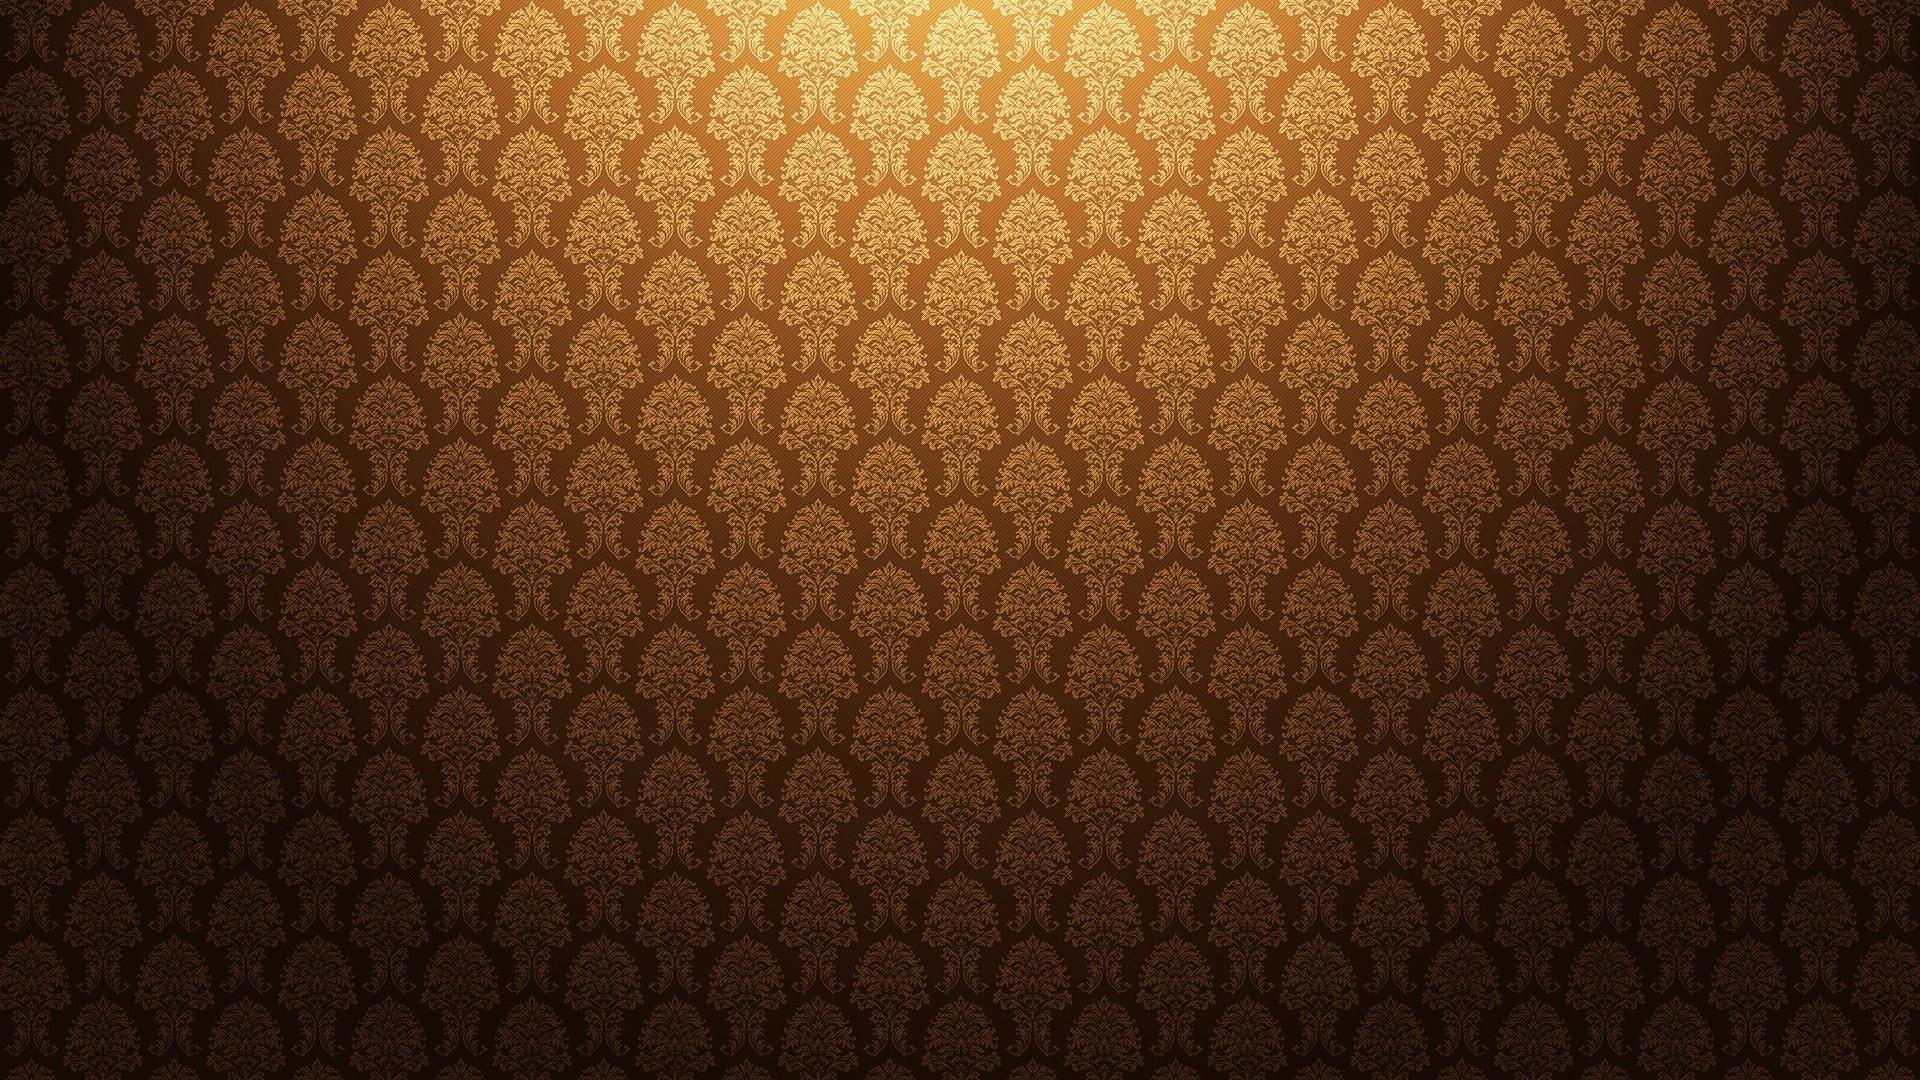 Download Wallpaper 1920x1080 gold, antique, background